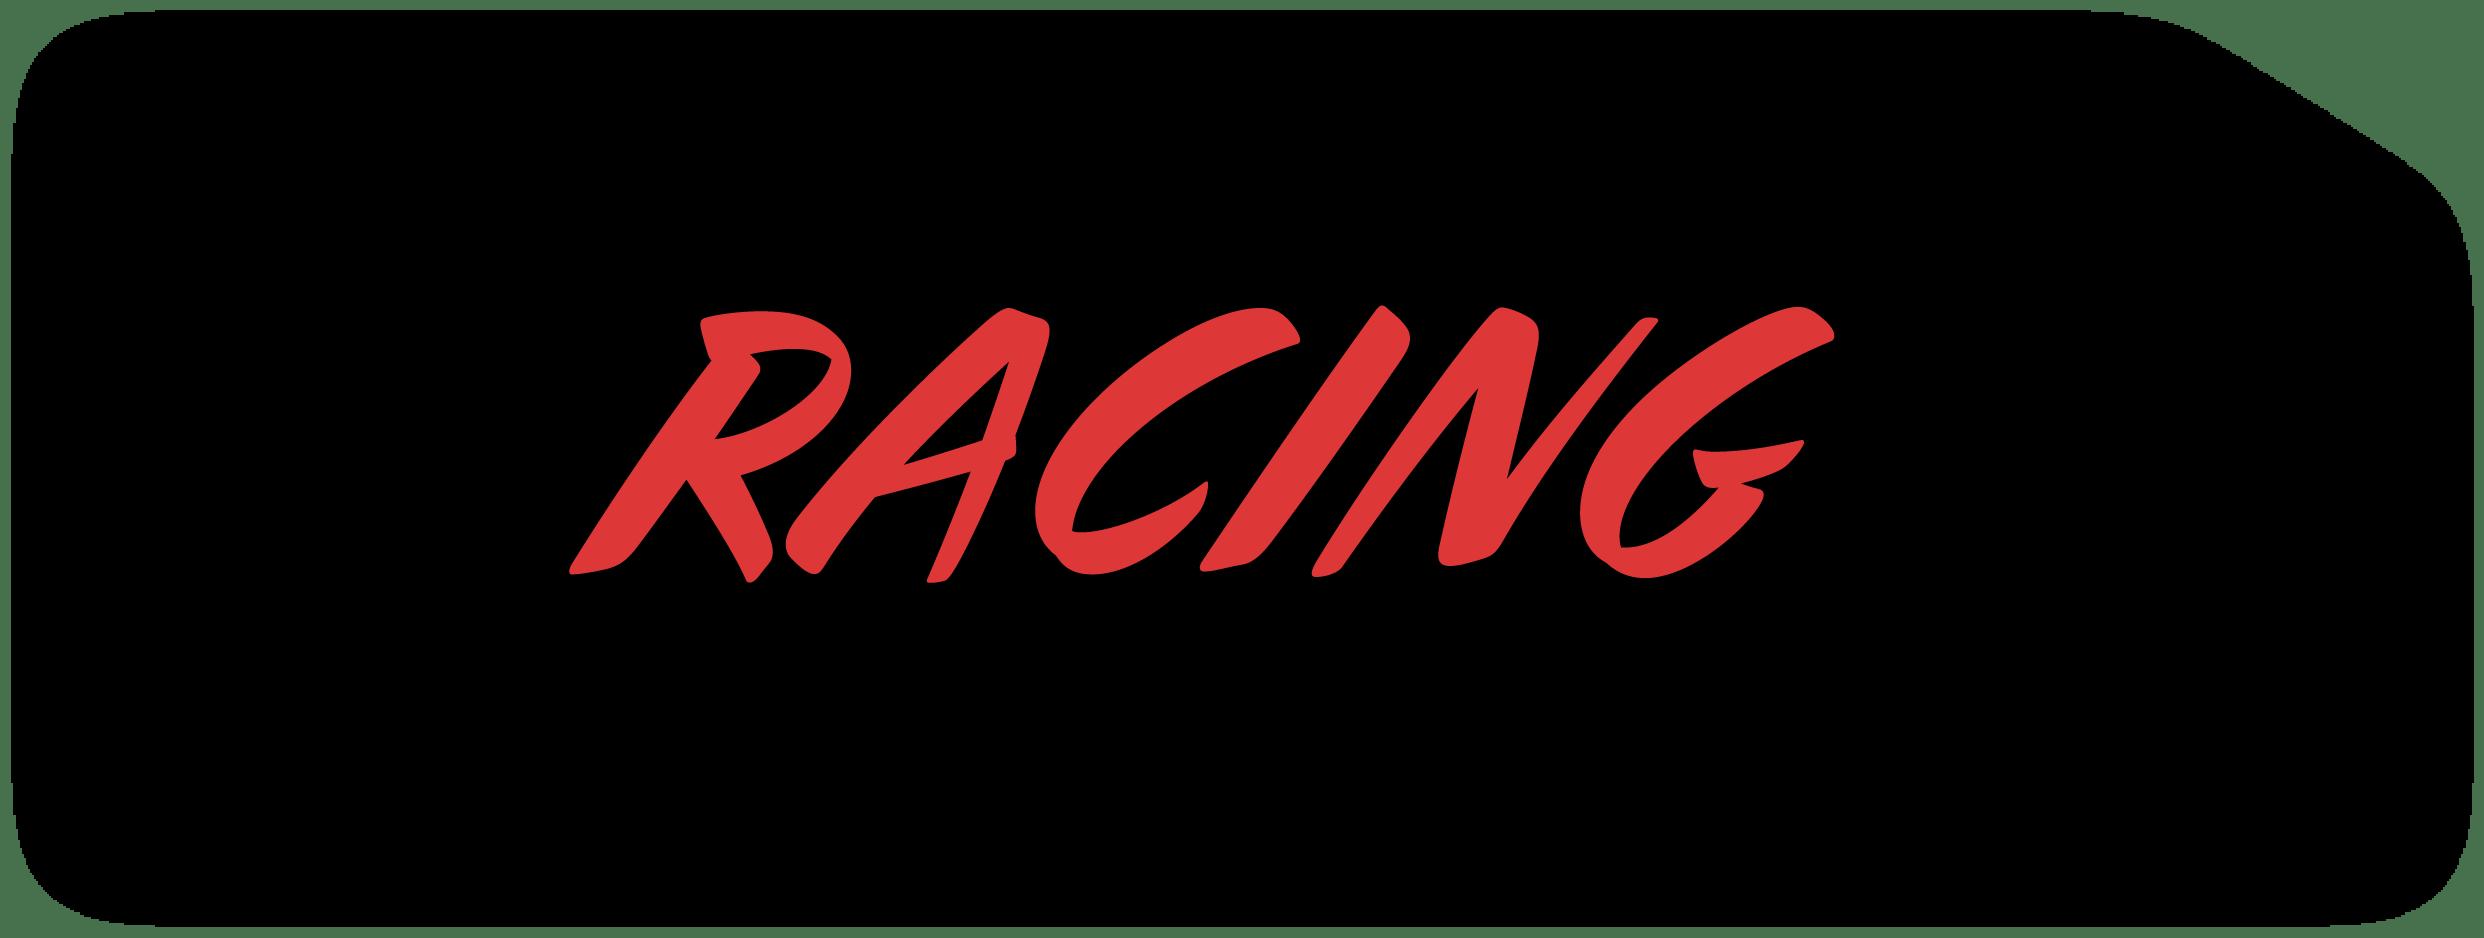 Racing button